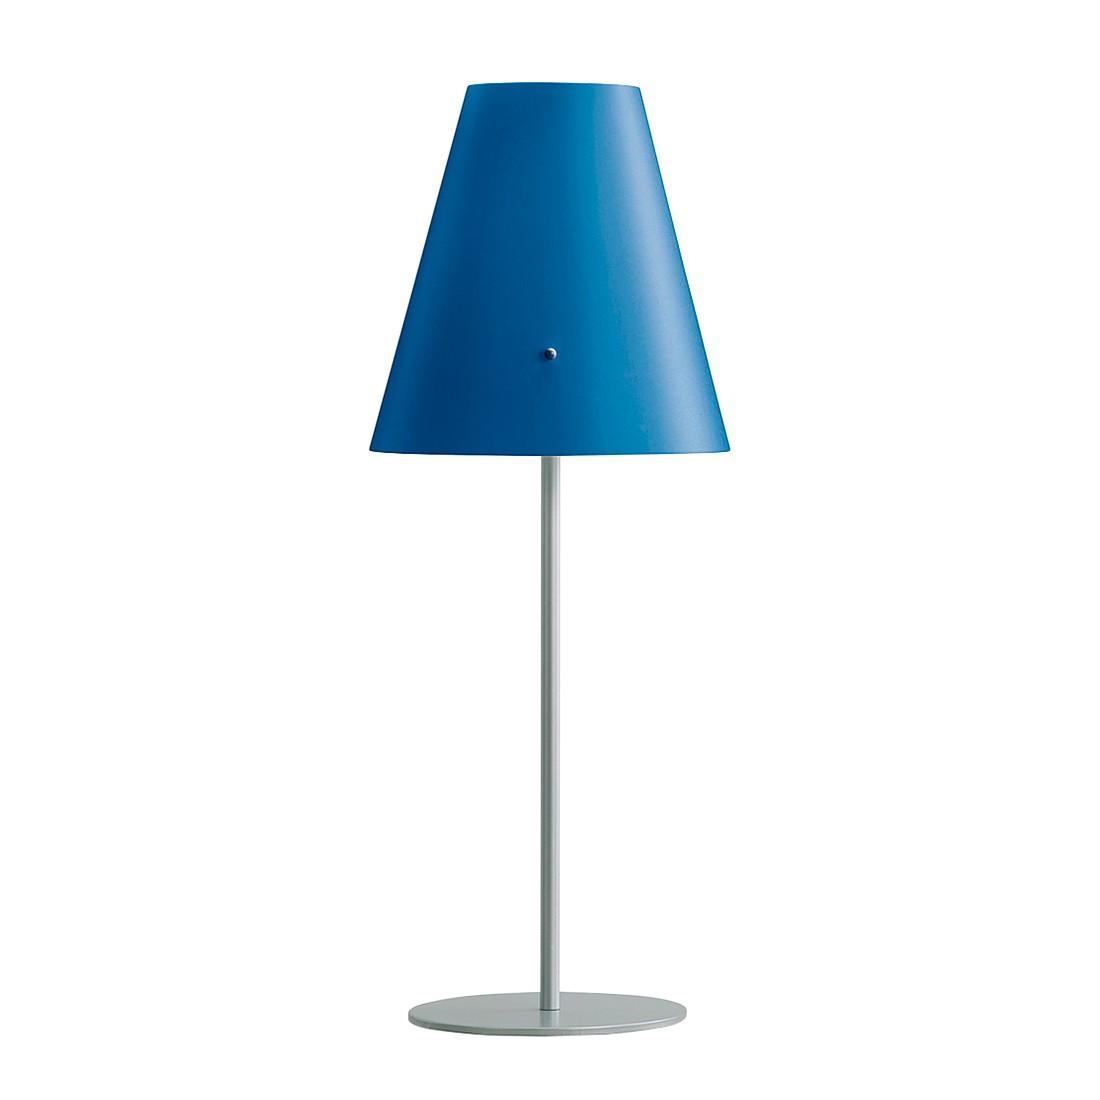 Tischleuchte Cosy ● Metall / Kunststoff ● Silbergrau / Blau ● 1-flammig- Blanke Design A